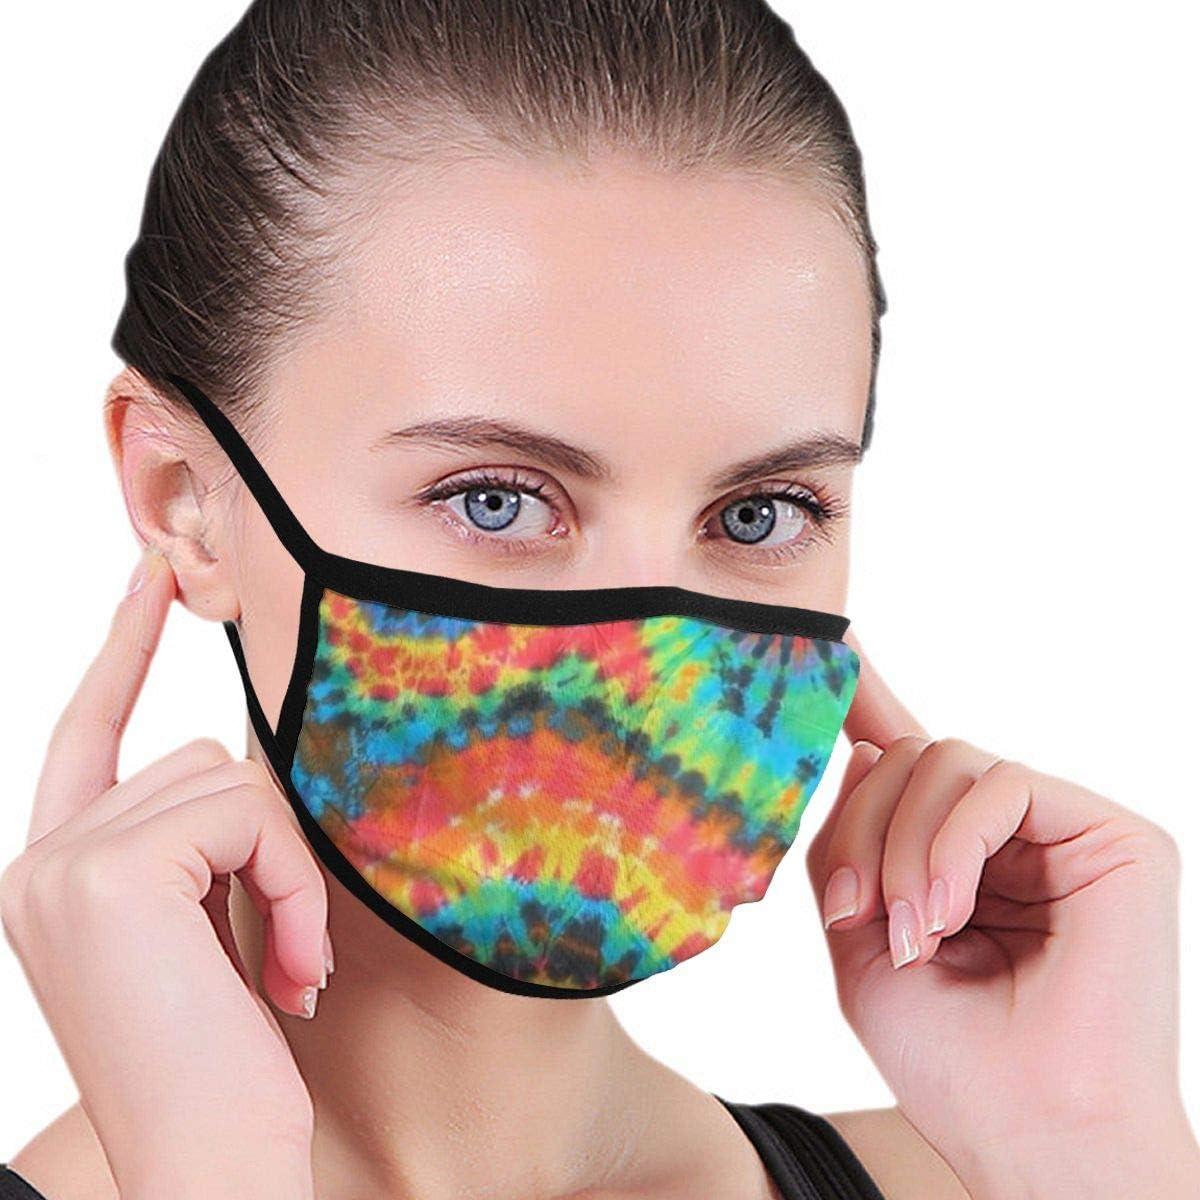 LANJYF 2 Packs Reusable Mouth Guard, Russian Nesting Dolls Pattern Unisex Cotton Face Cloth